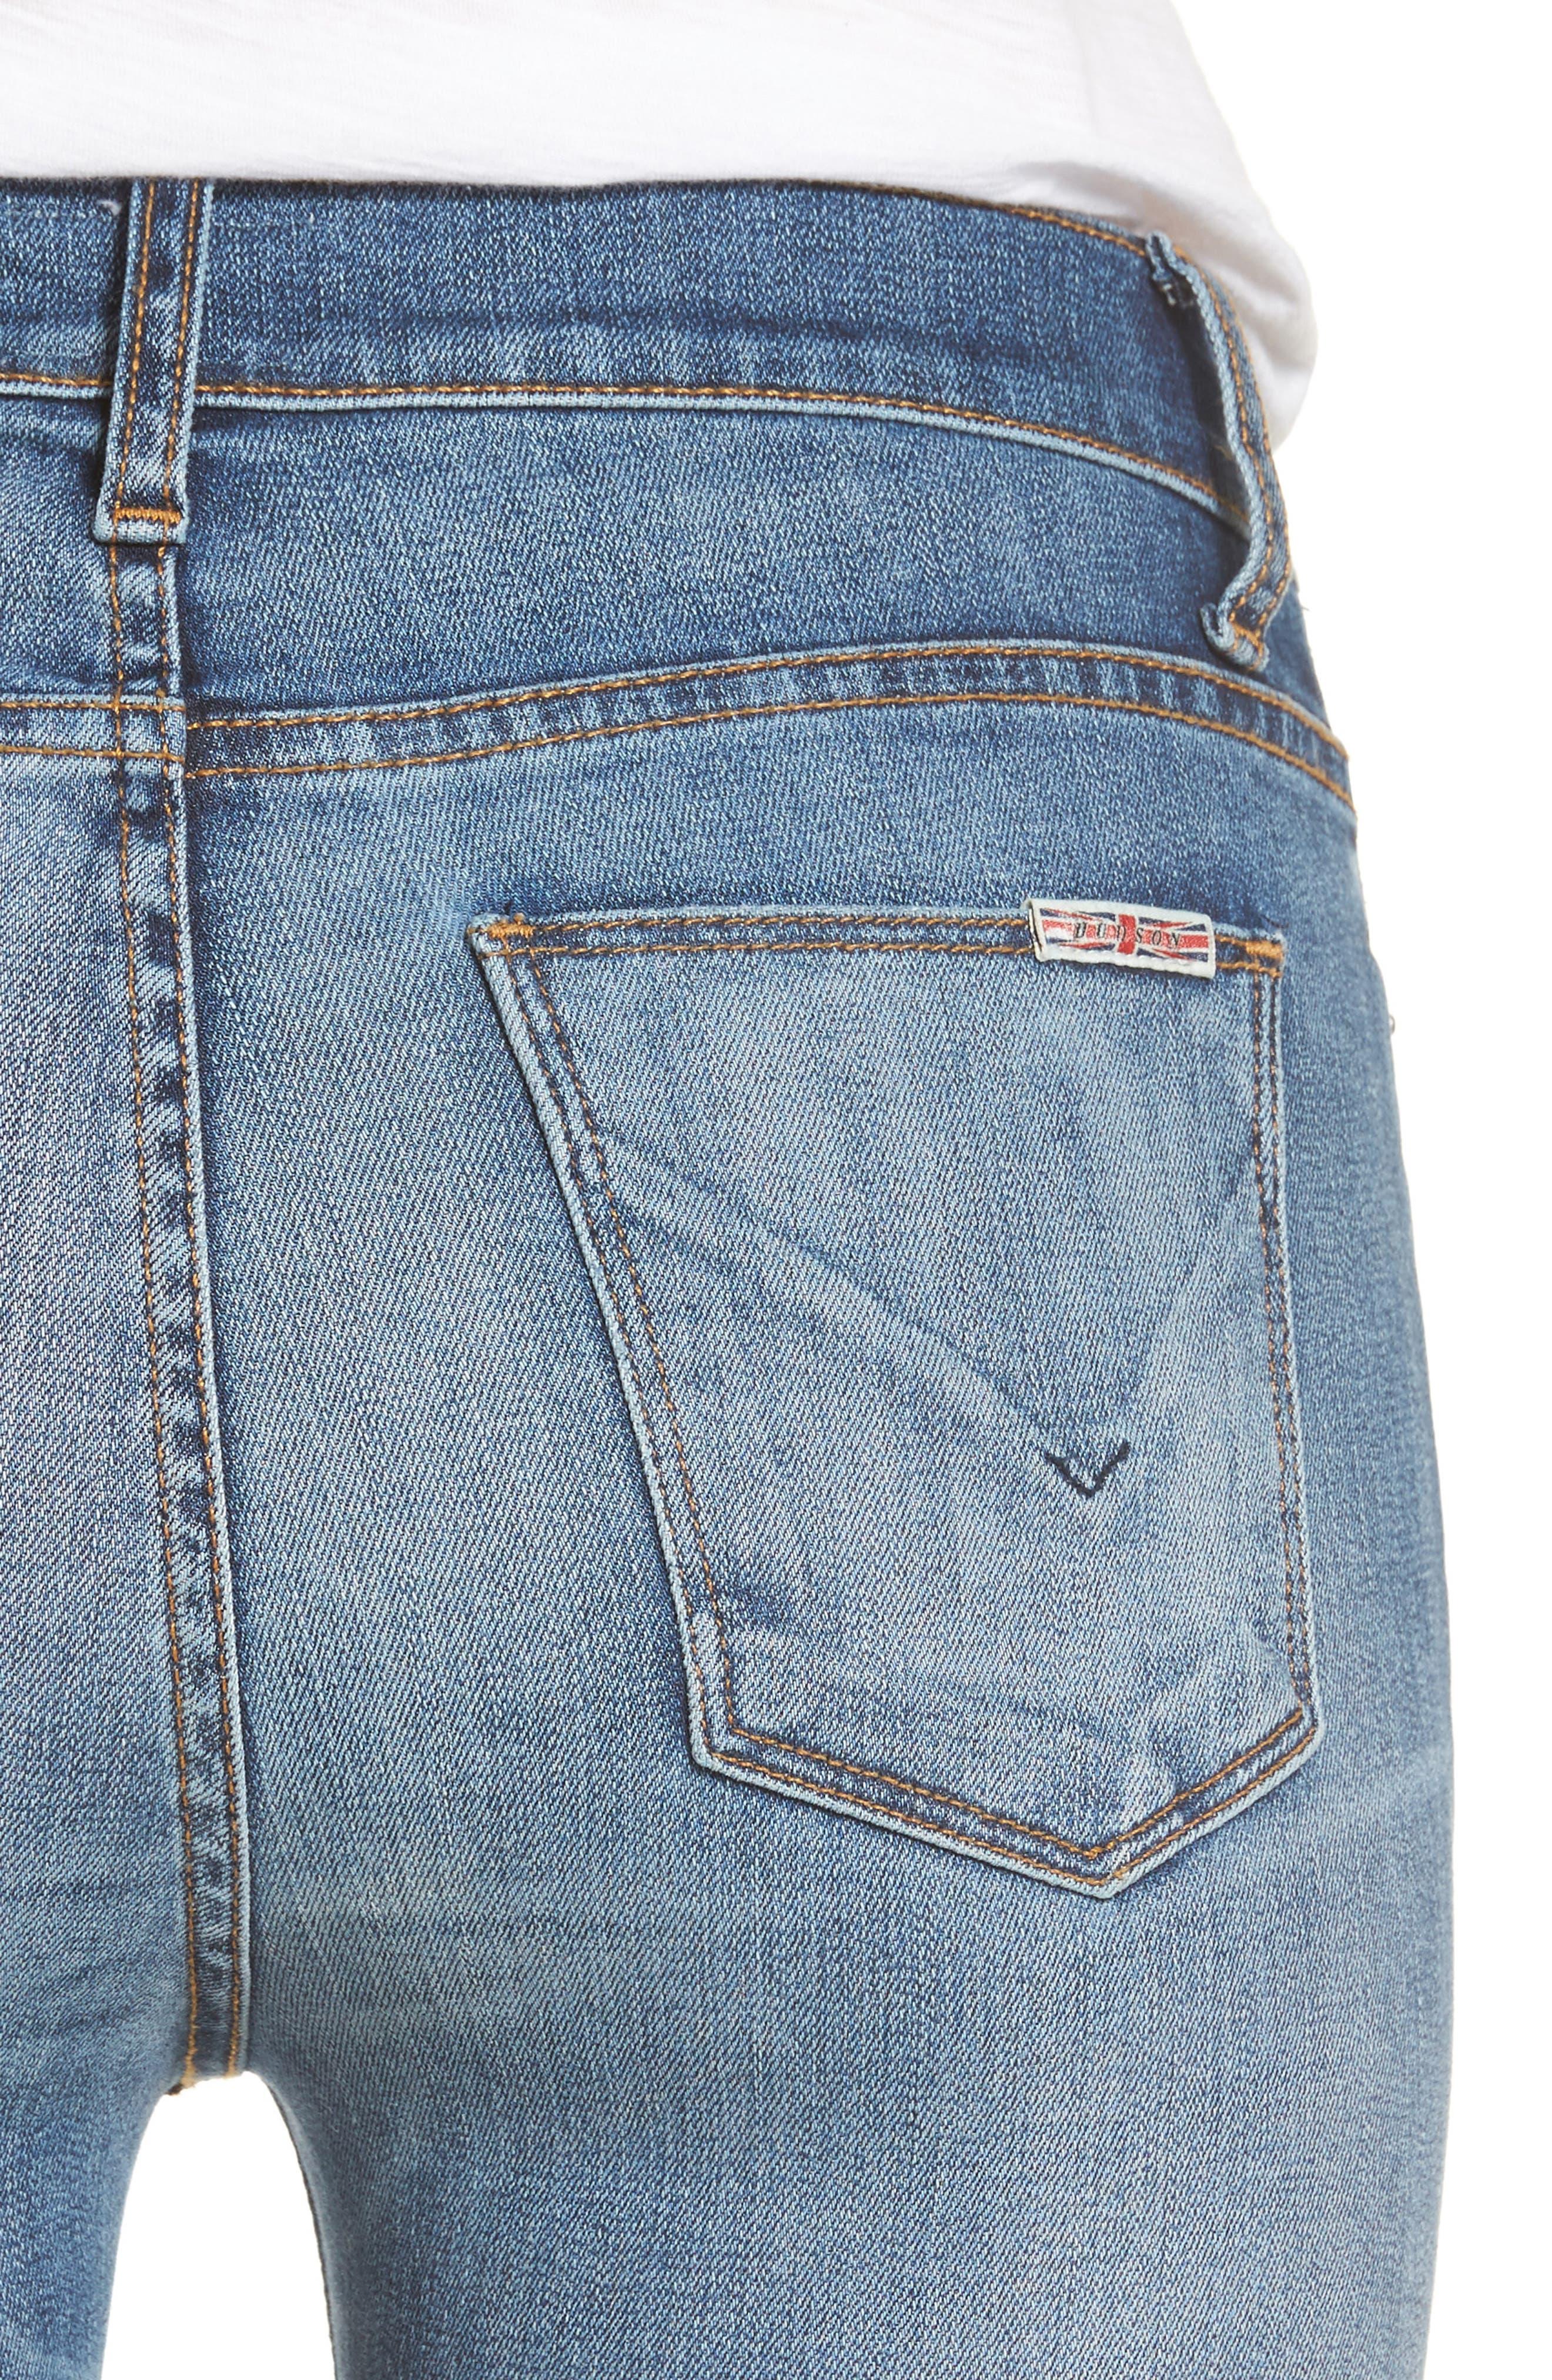 Ciara High Waist Skinny Jeans,                             Alternate thumbnail 7, color,